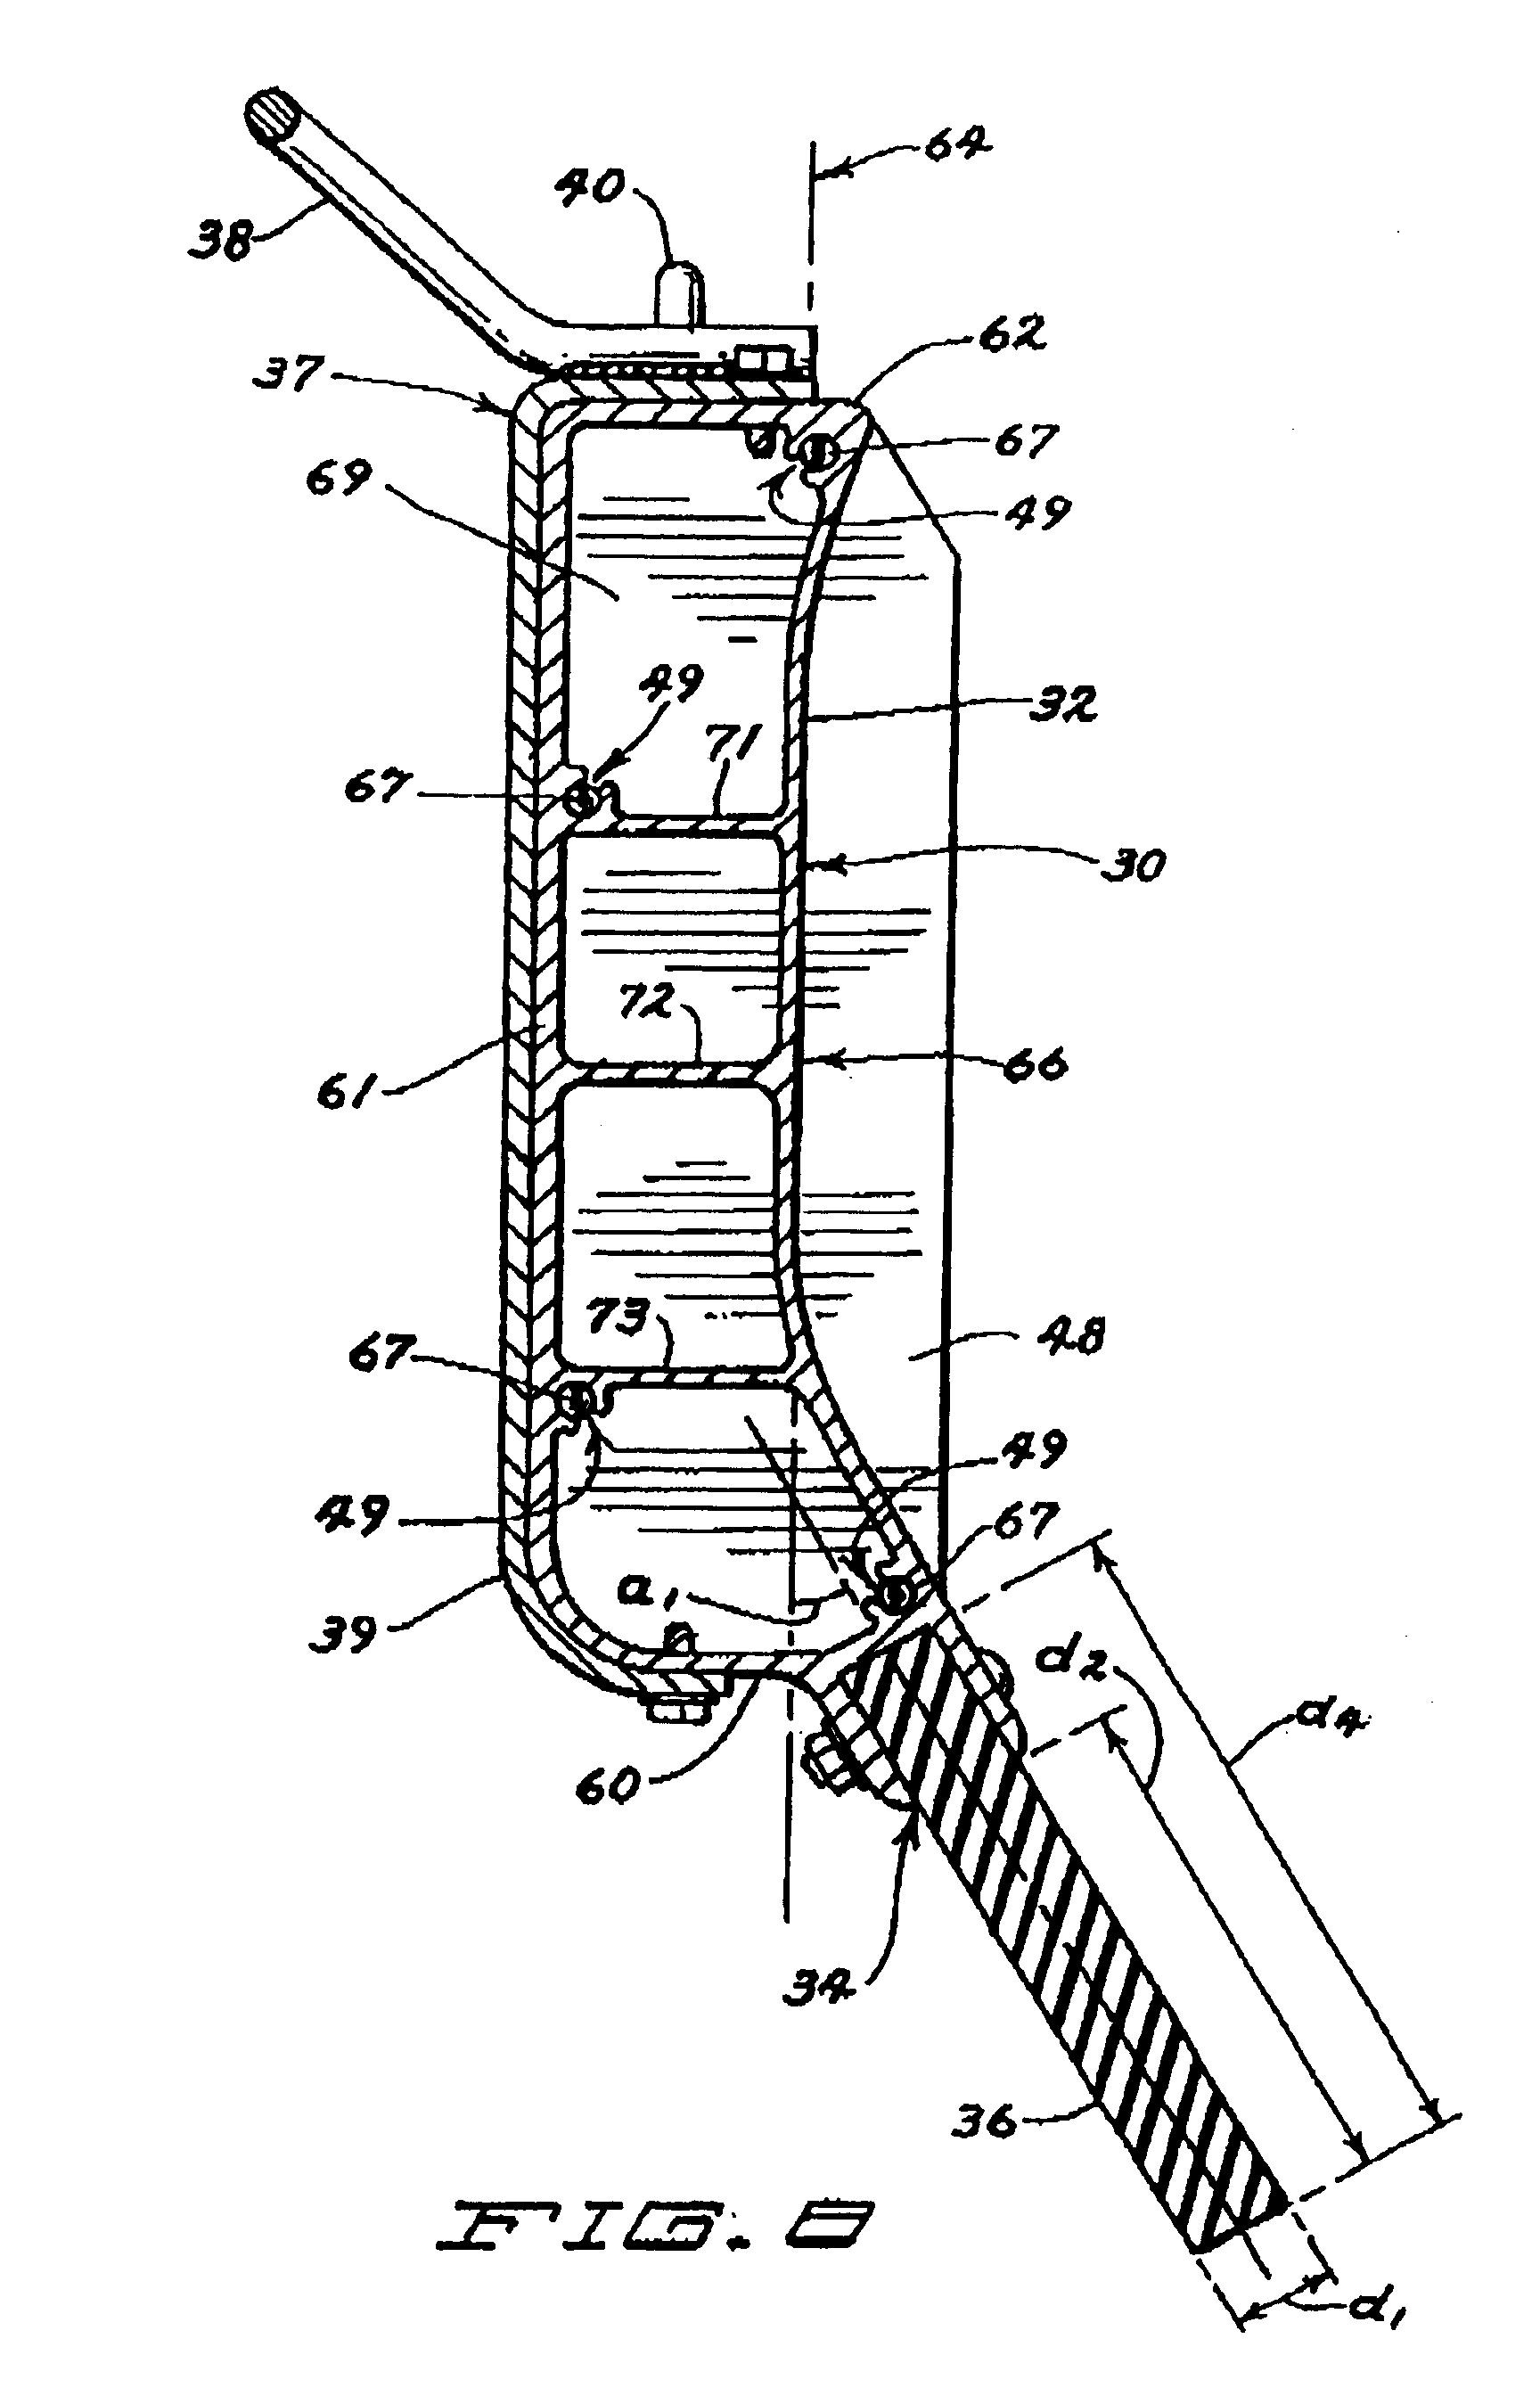 Patent us20070056193 snow plow having wear minimizing apparatus us20070056193a1 20070315 d00005 us20070056193 leo plow wiring diagram